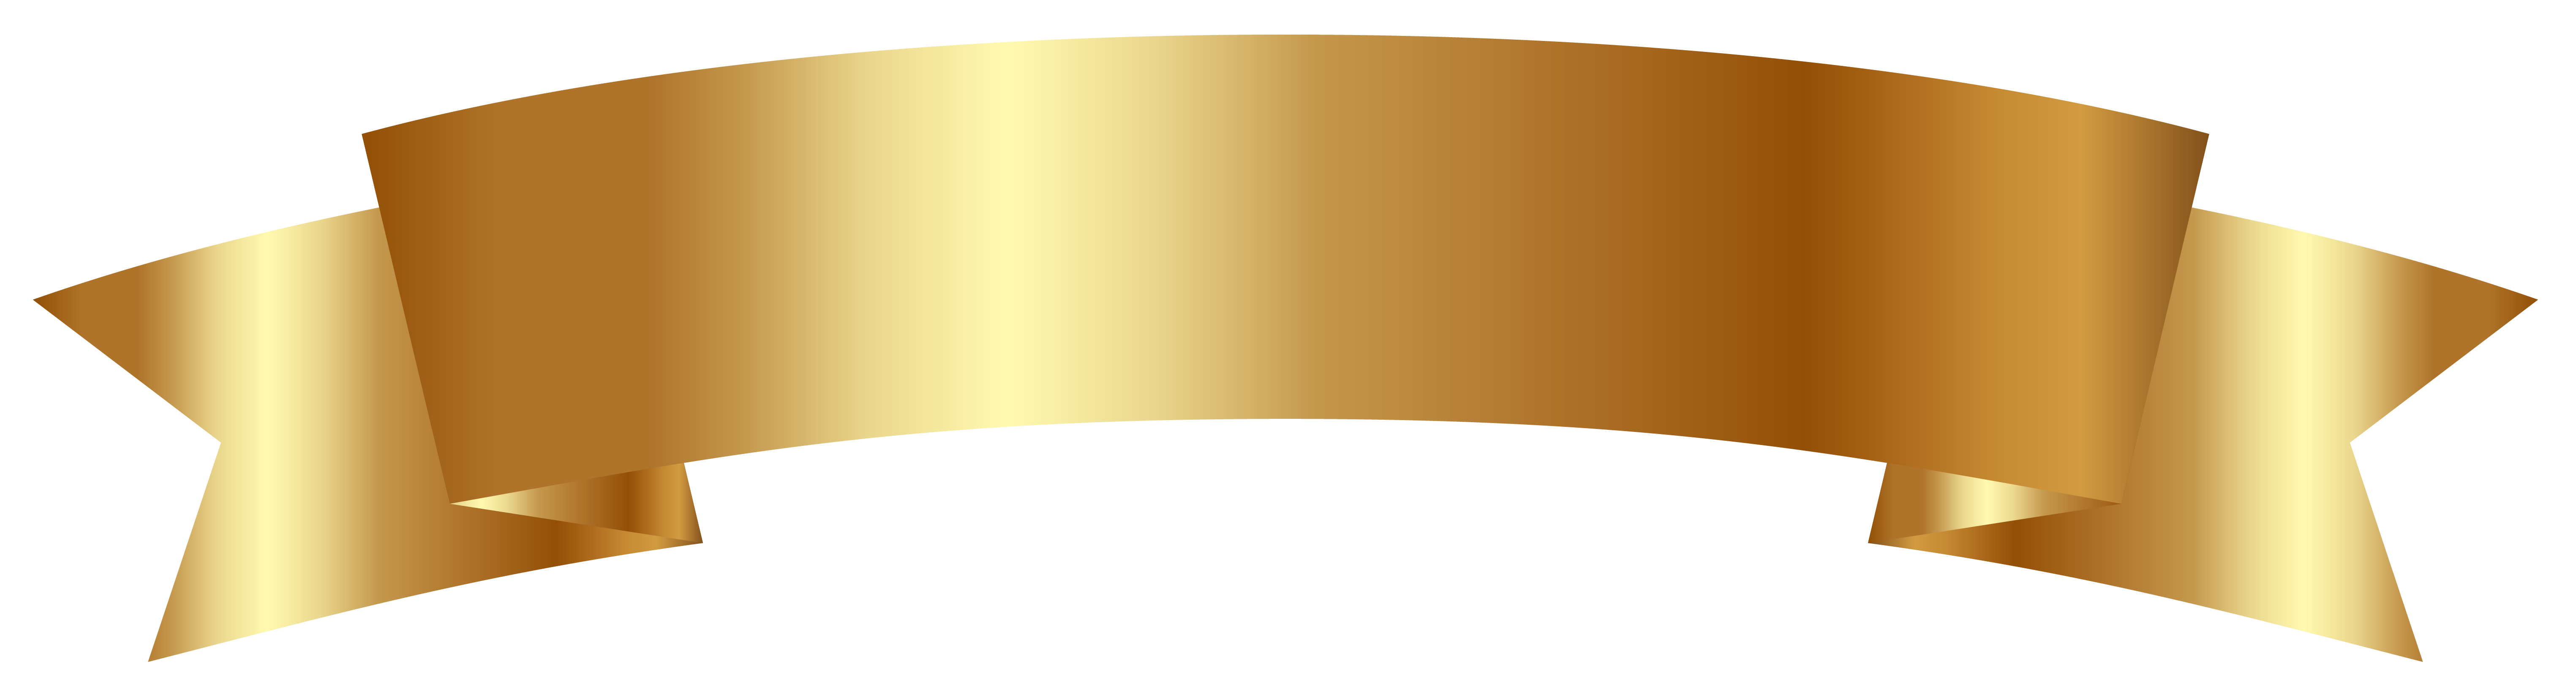 Gold Banner Ribbon Clip art.